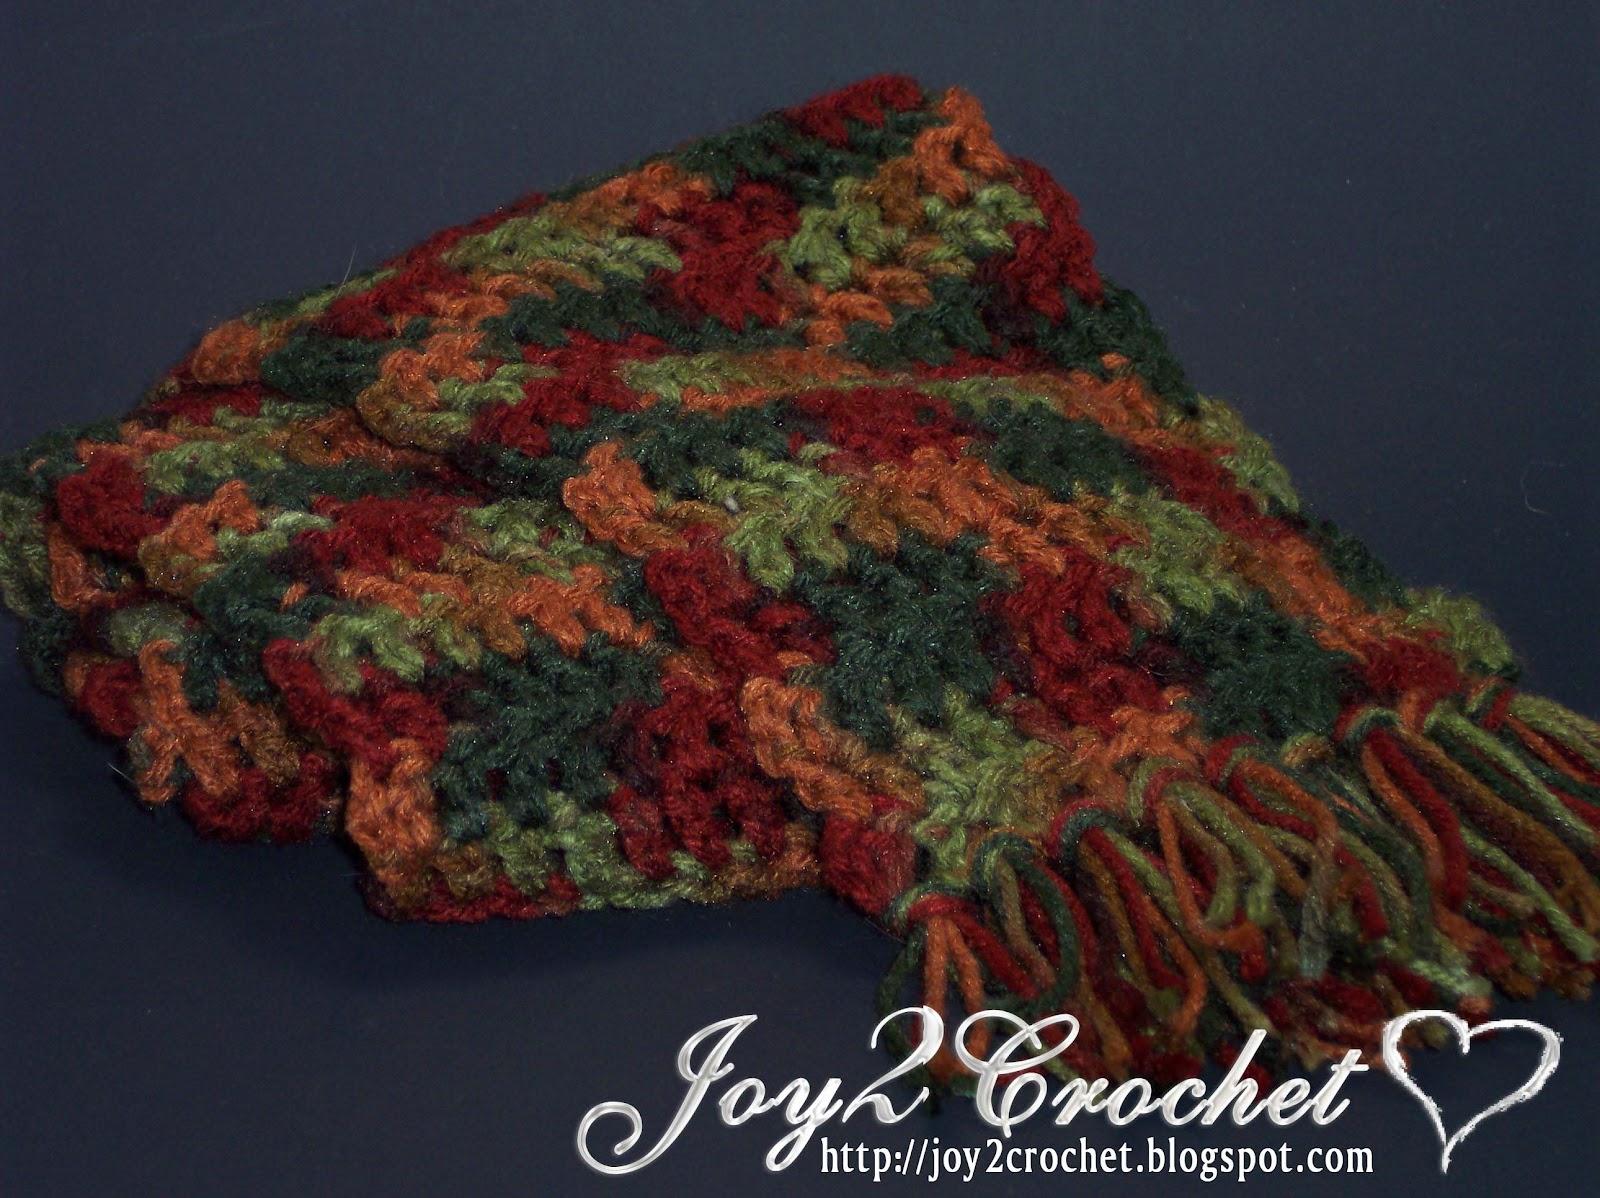 Joy 2 Crochet: One Day, One Skein Scarfs